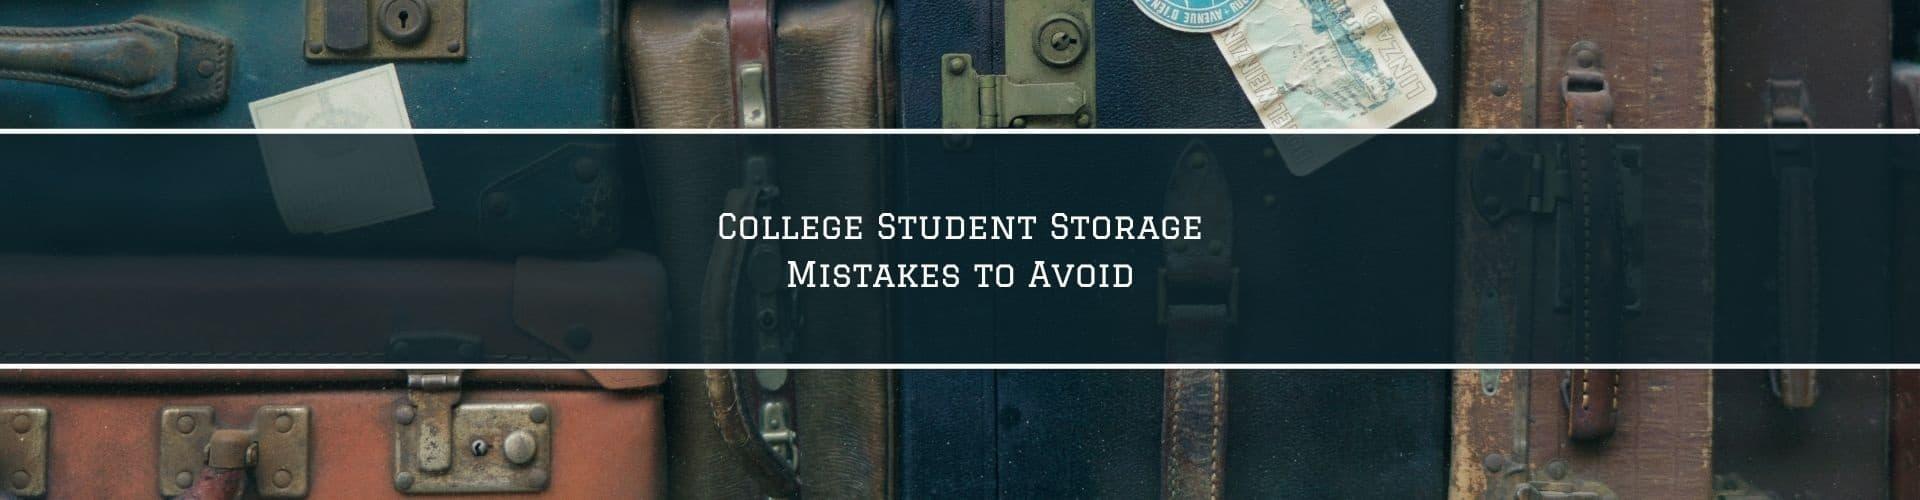 College Storage Mistakes